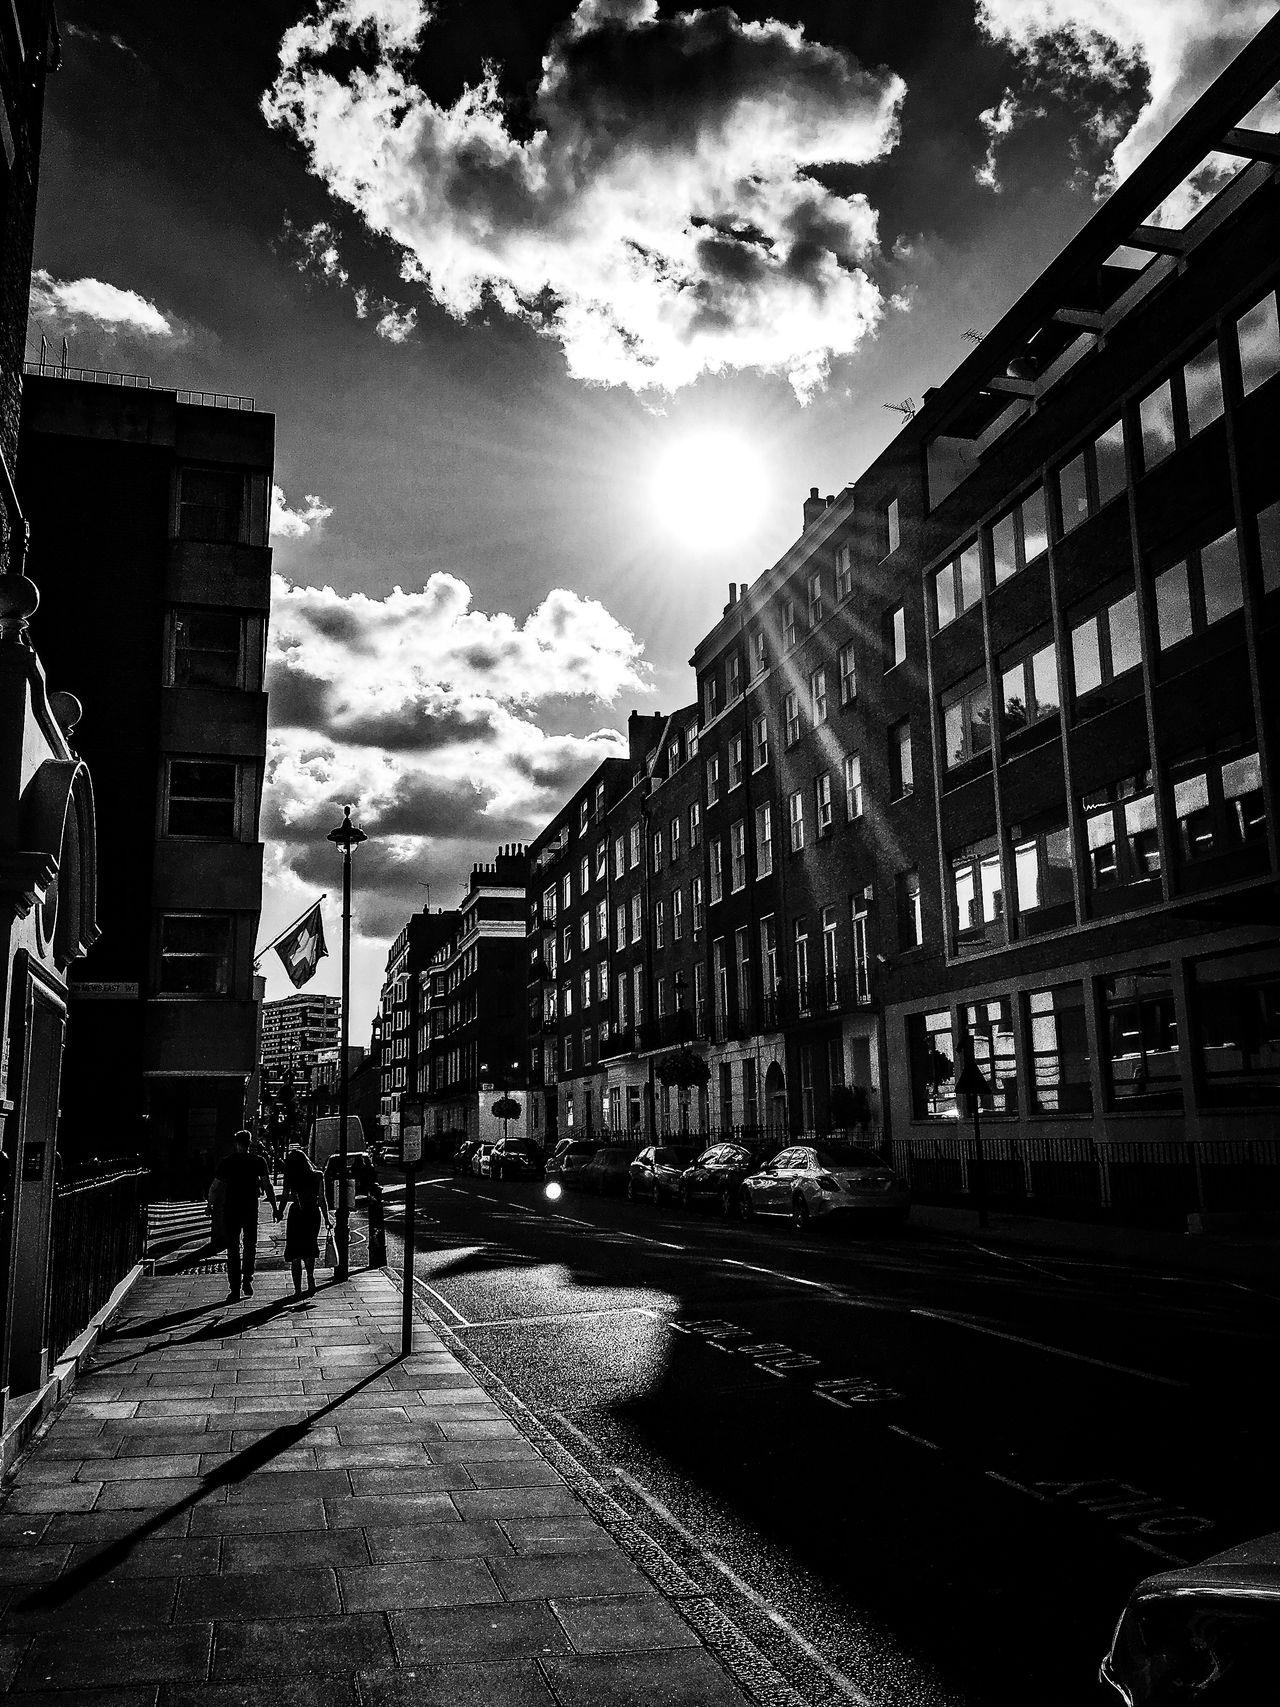 Couple Walking Hand In Hand Black And White Dark Sun Artistic London Showcase July The Week Of Eyeem Architecture Cloudporn Urban Exploration Creative Photography Windows Fine Art Fine Art Photography Clouds Reflections Streetphotography